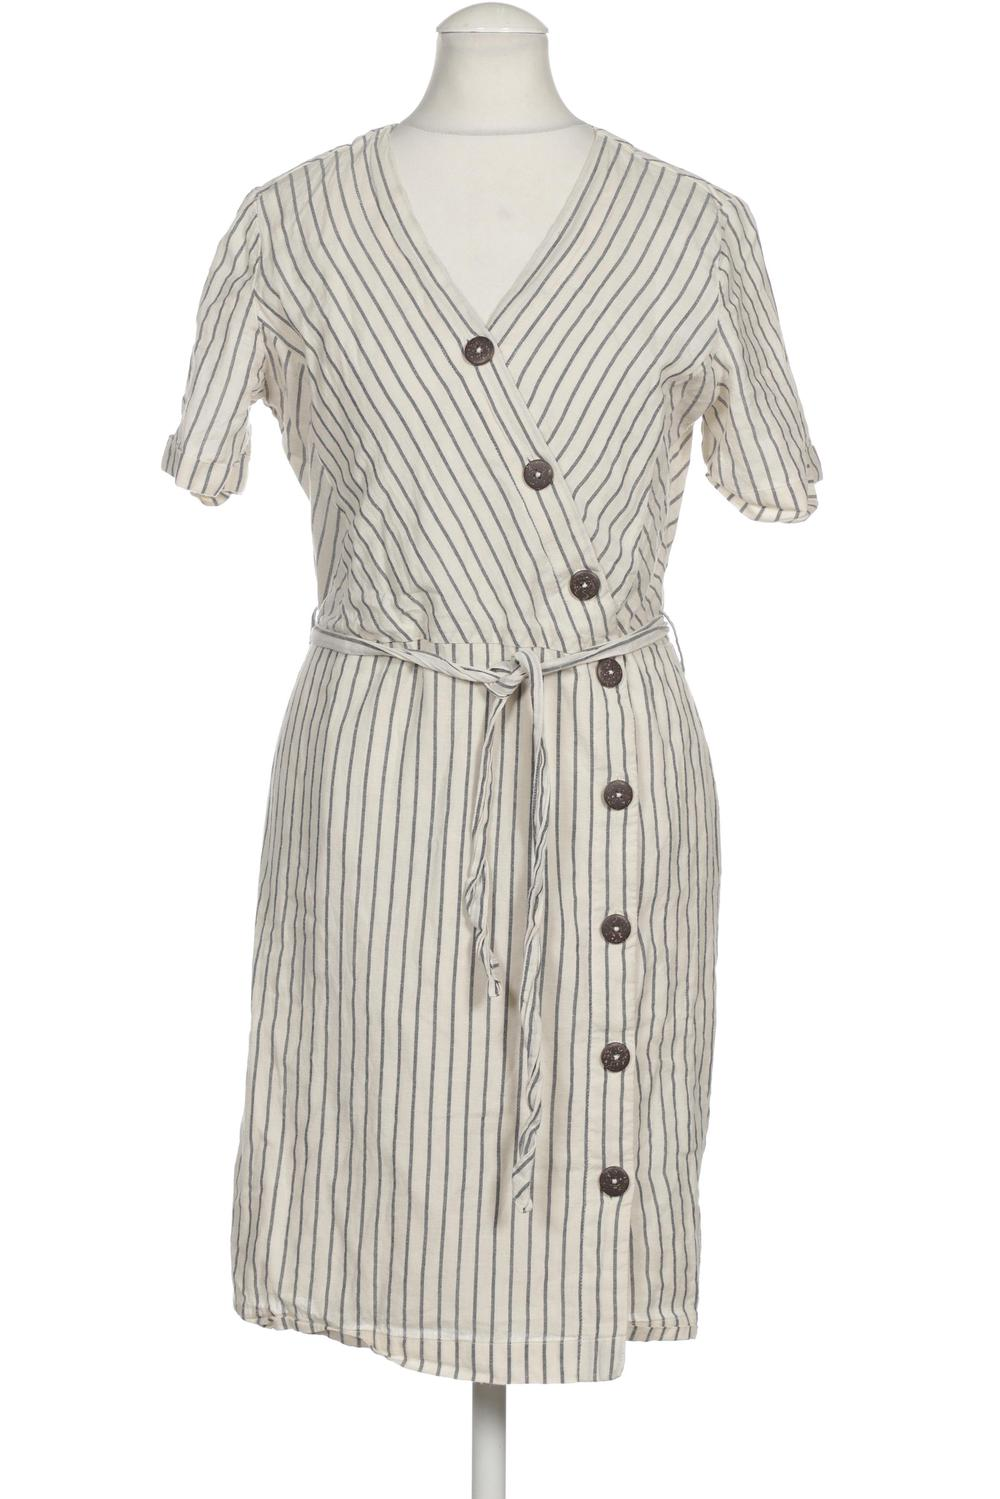 Esprit Kleid Damen Dress Damenkleid Gr. DE 34 Baumwolle ...